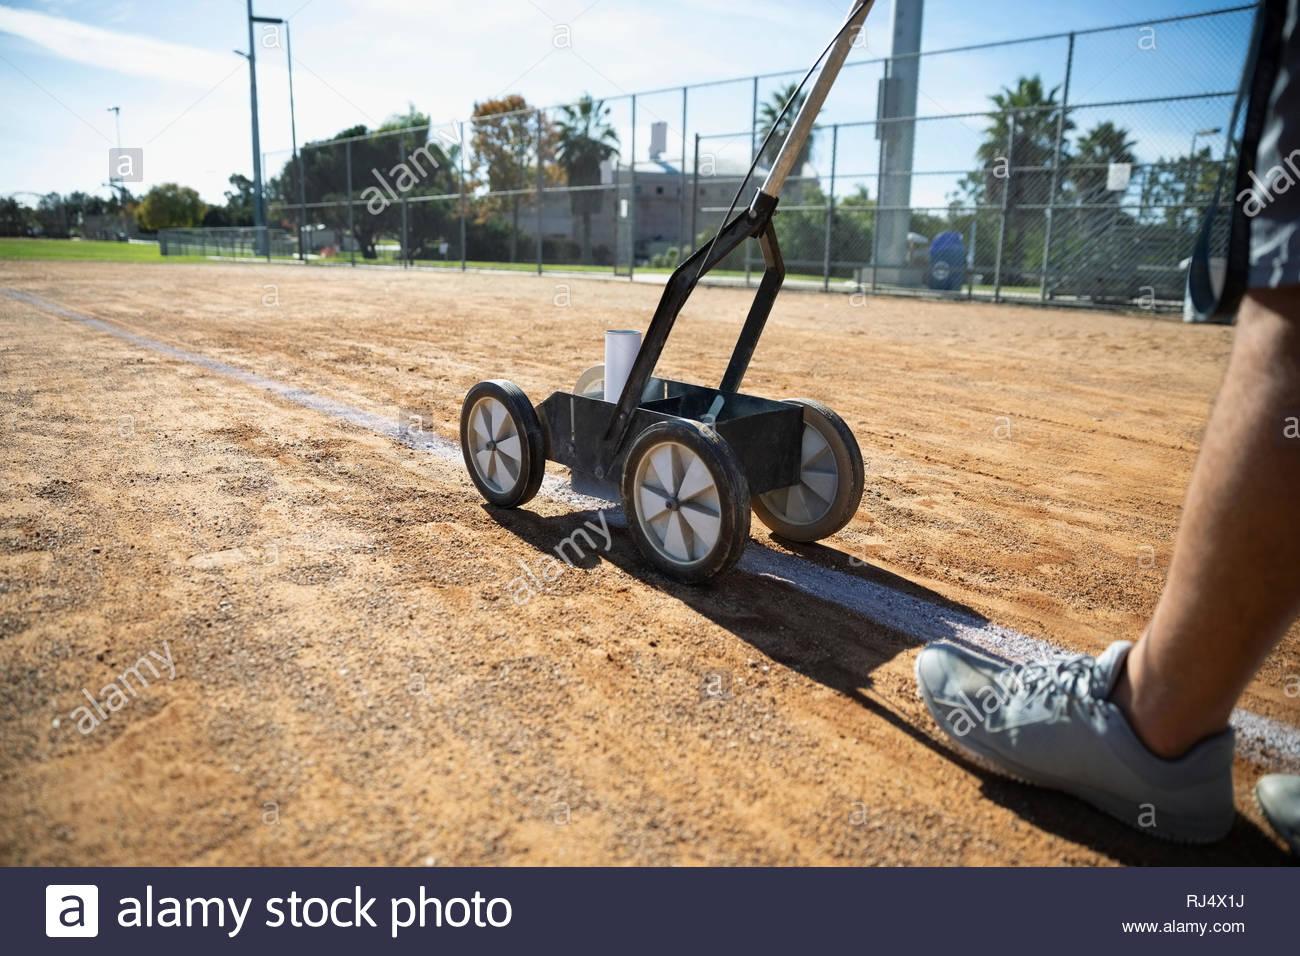 Man lining sunny baseball field - Stock Image